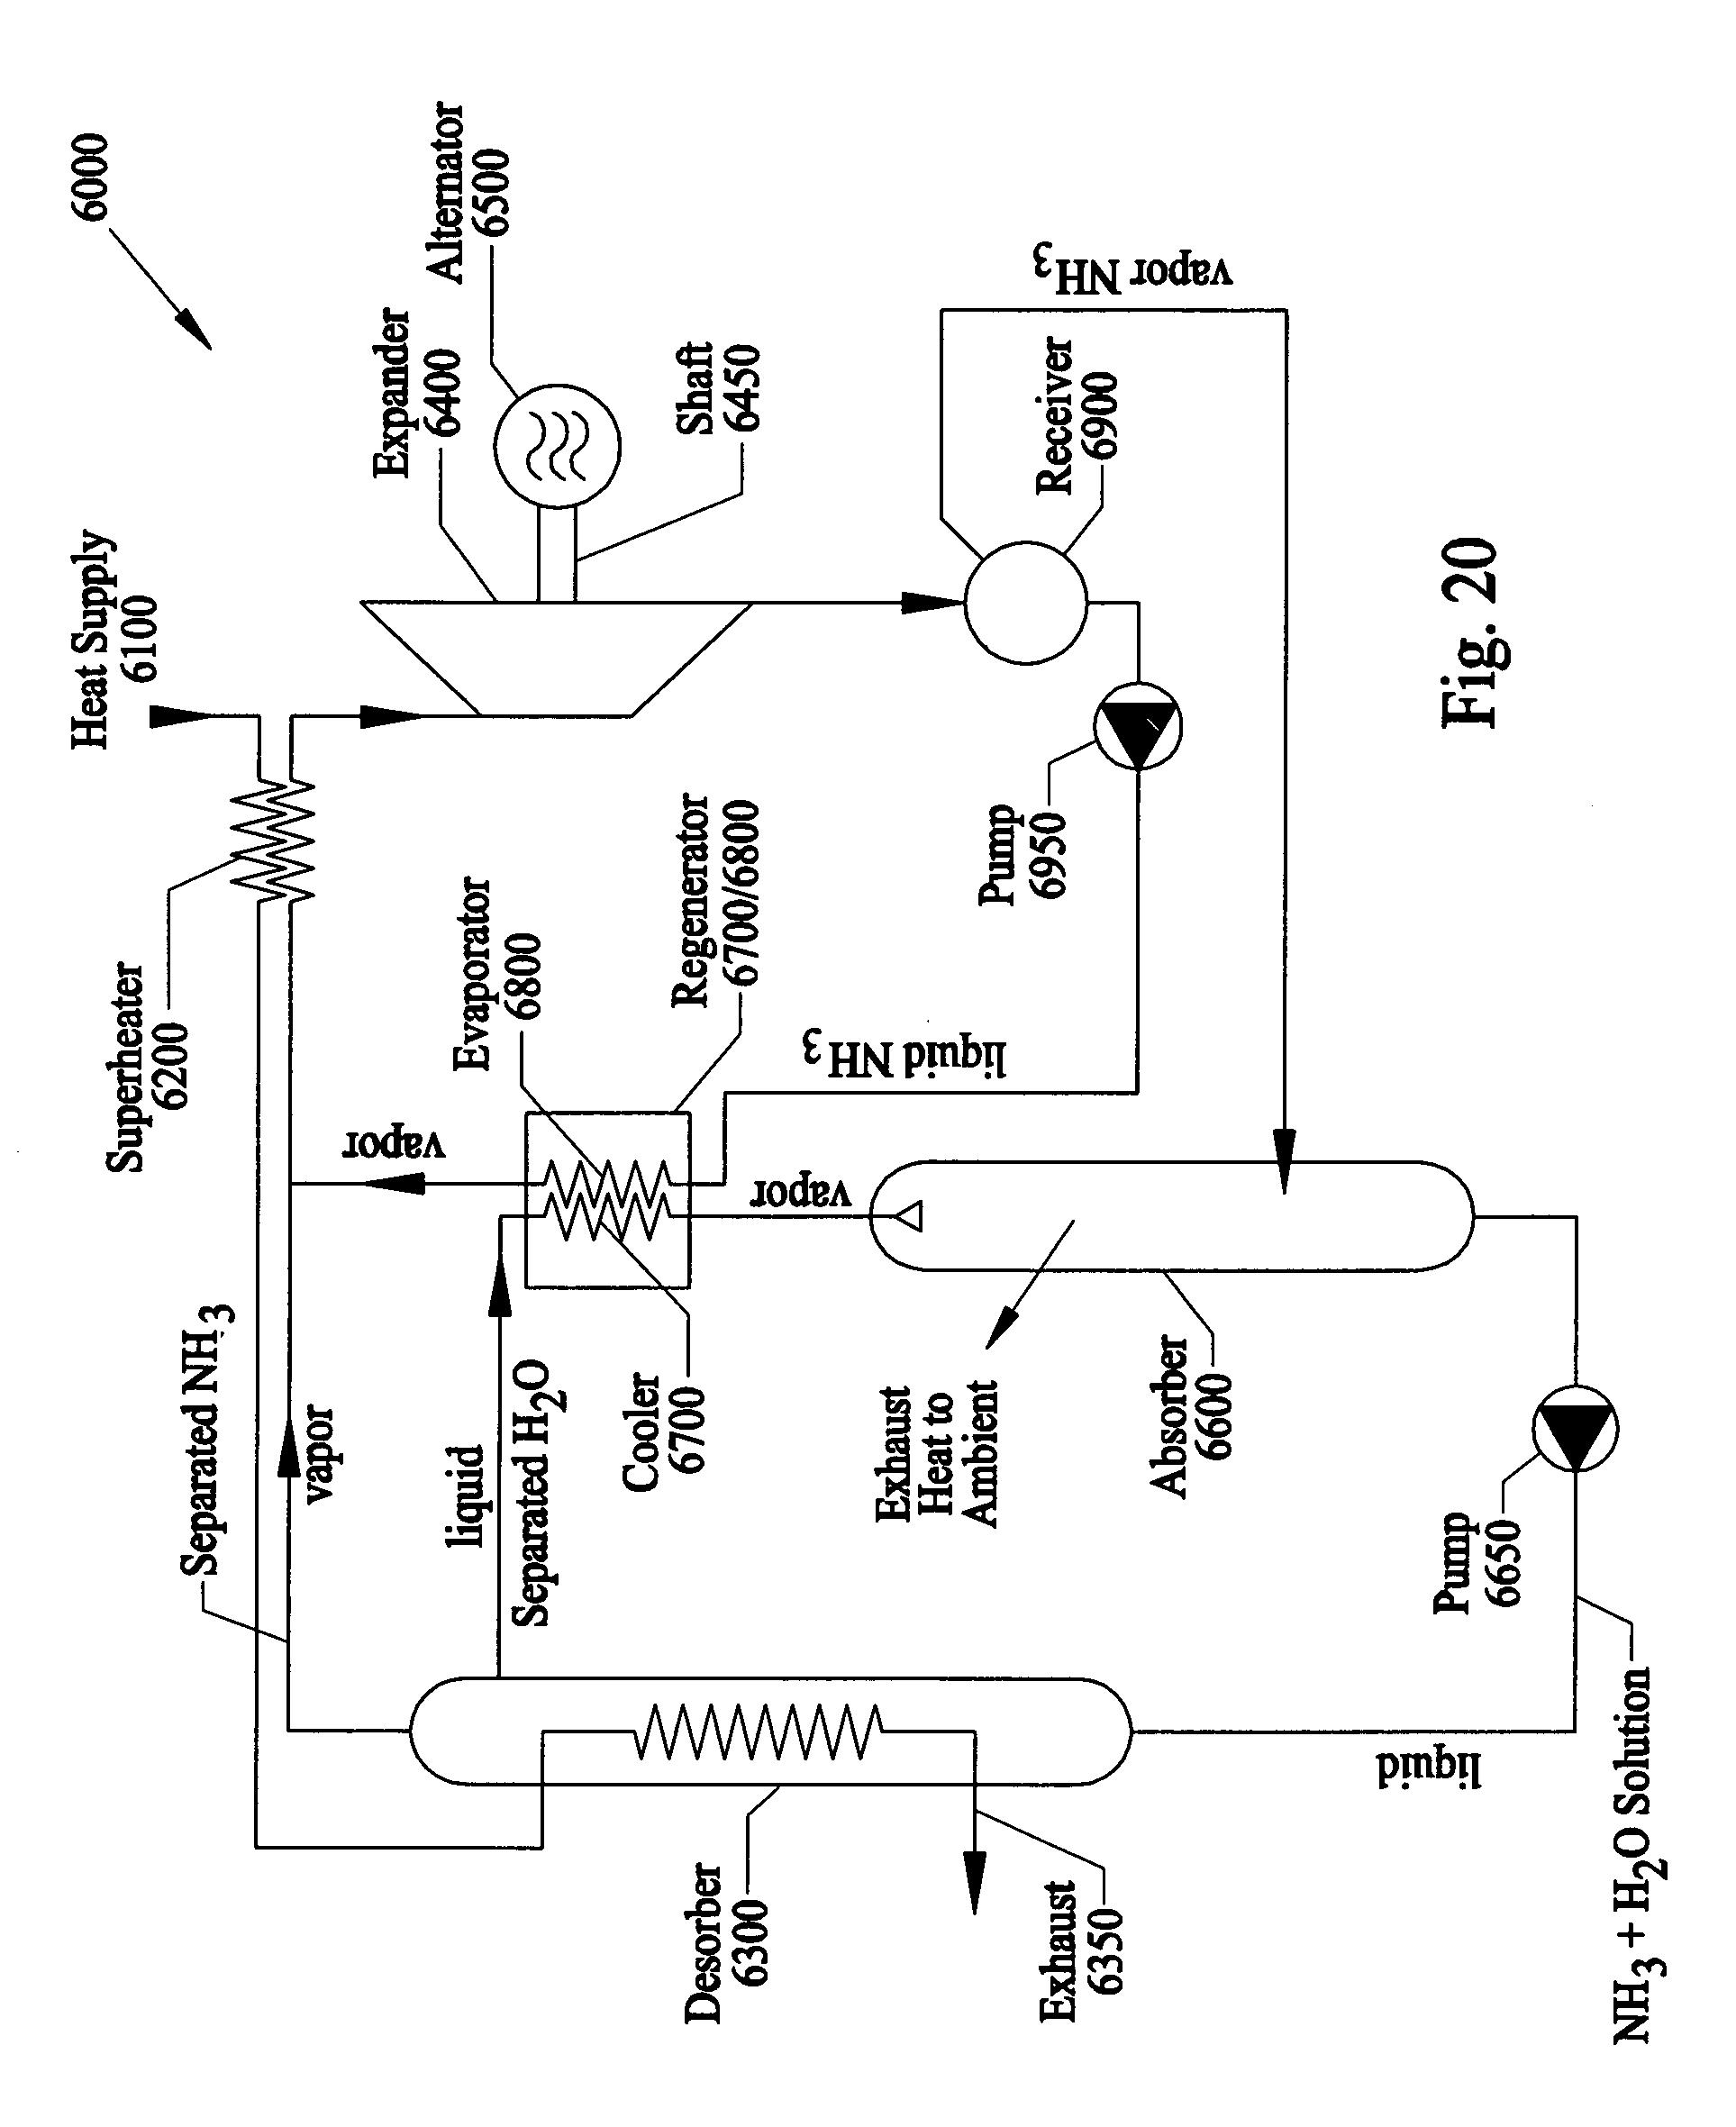 dodge wiring diagrams free wiring diagrams weebly com lasko wiring diagrams lasko replacement parts wiring diagram fuse box